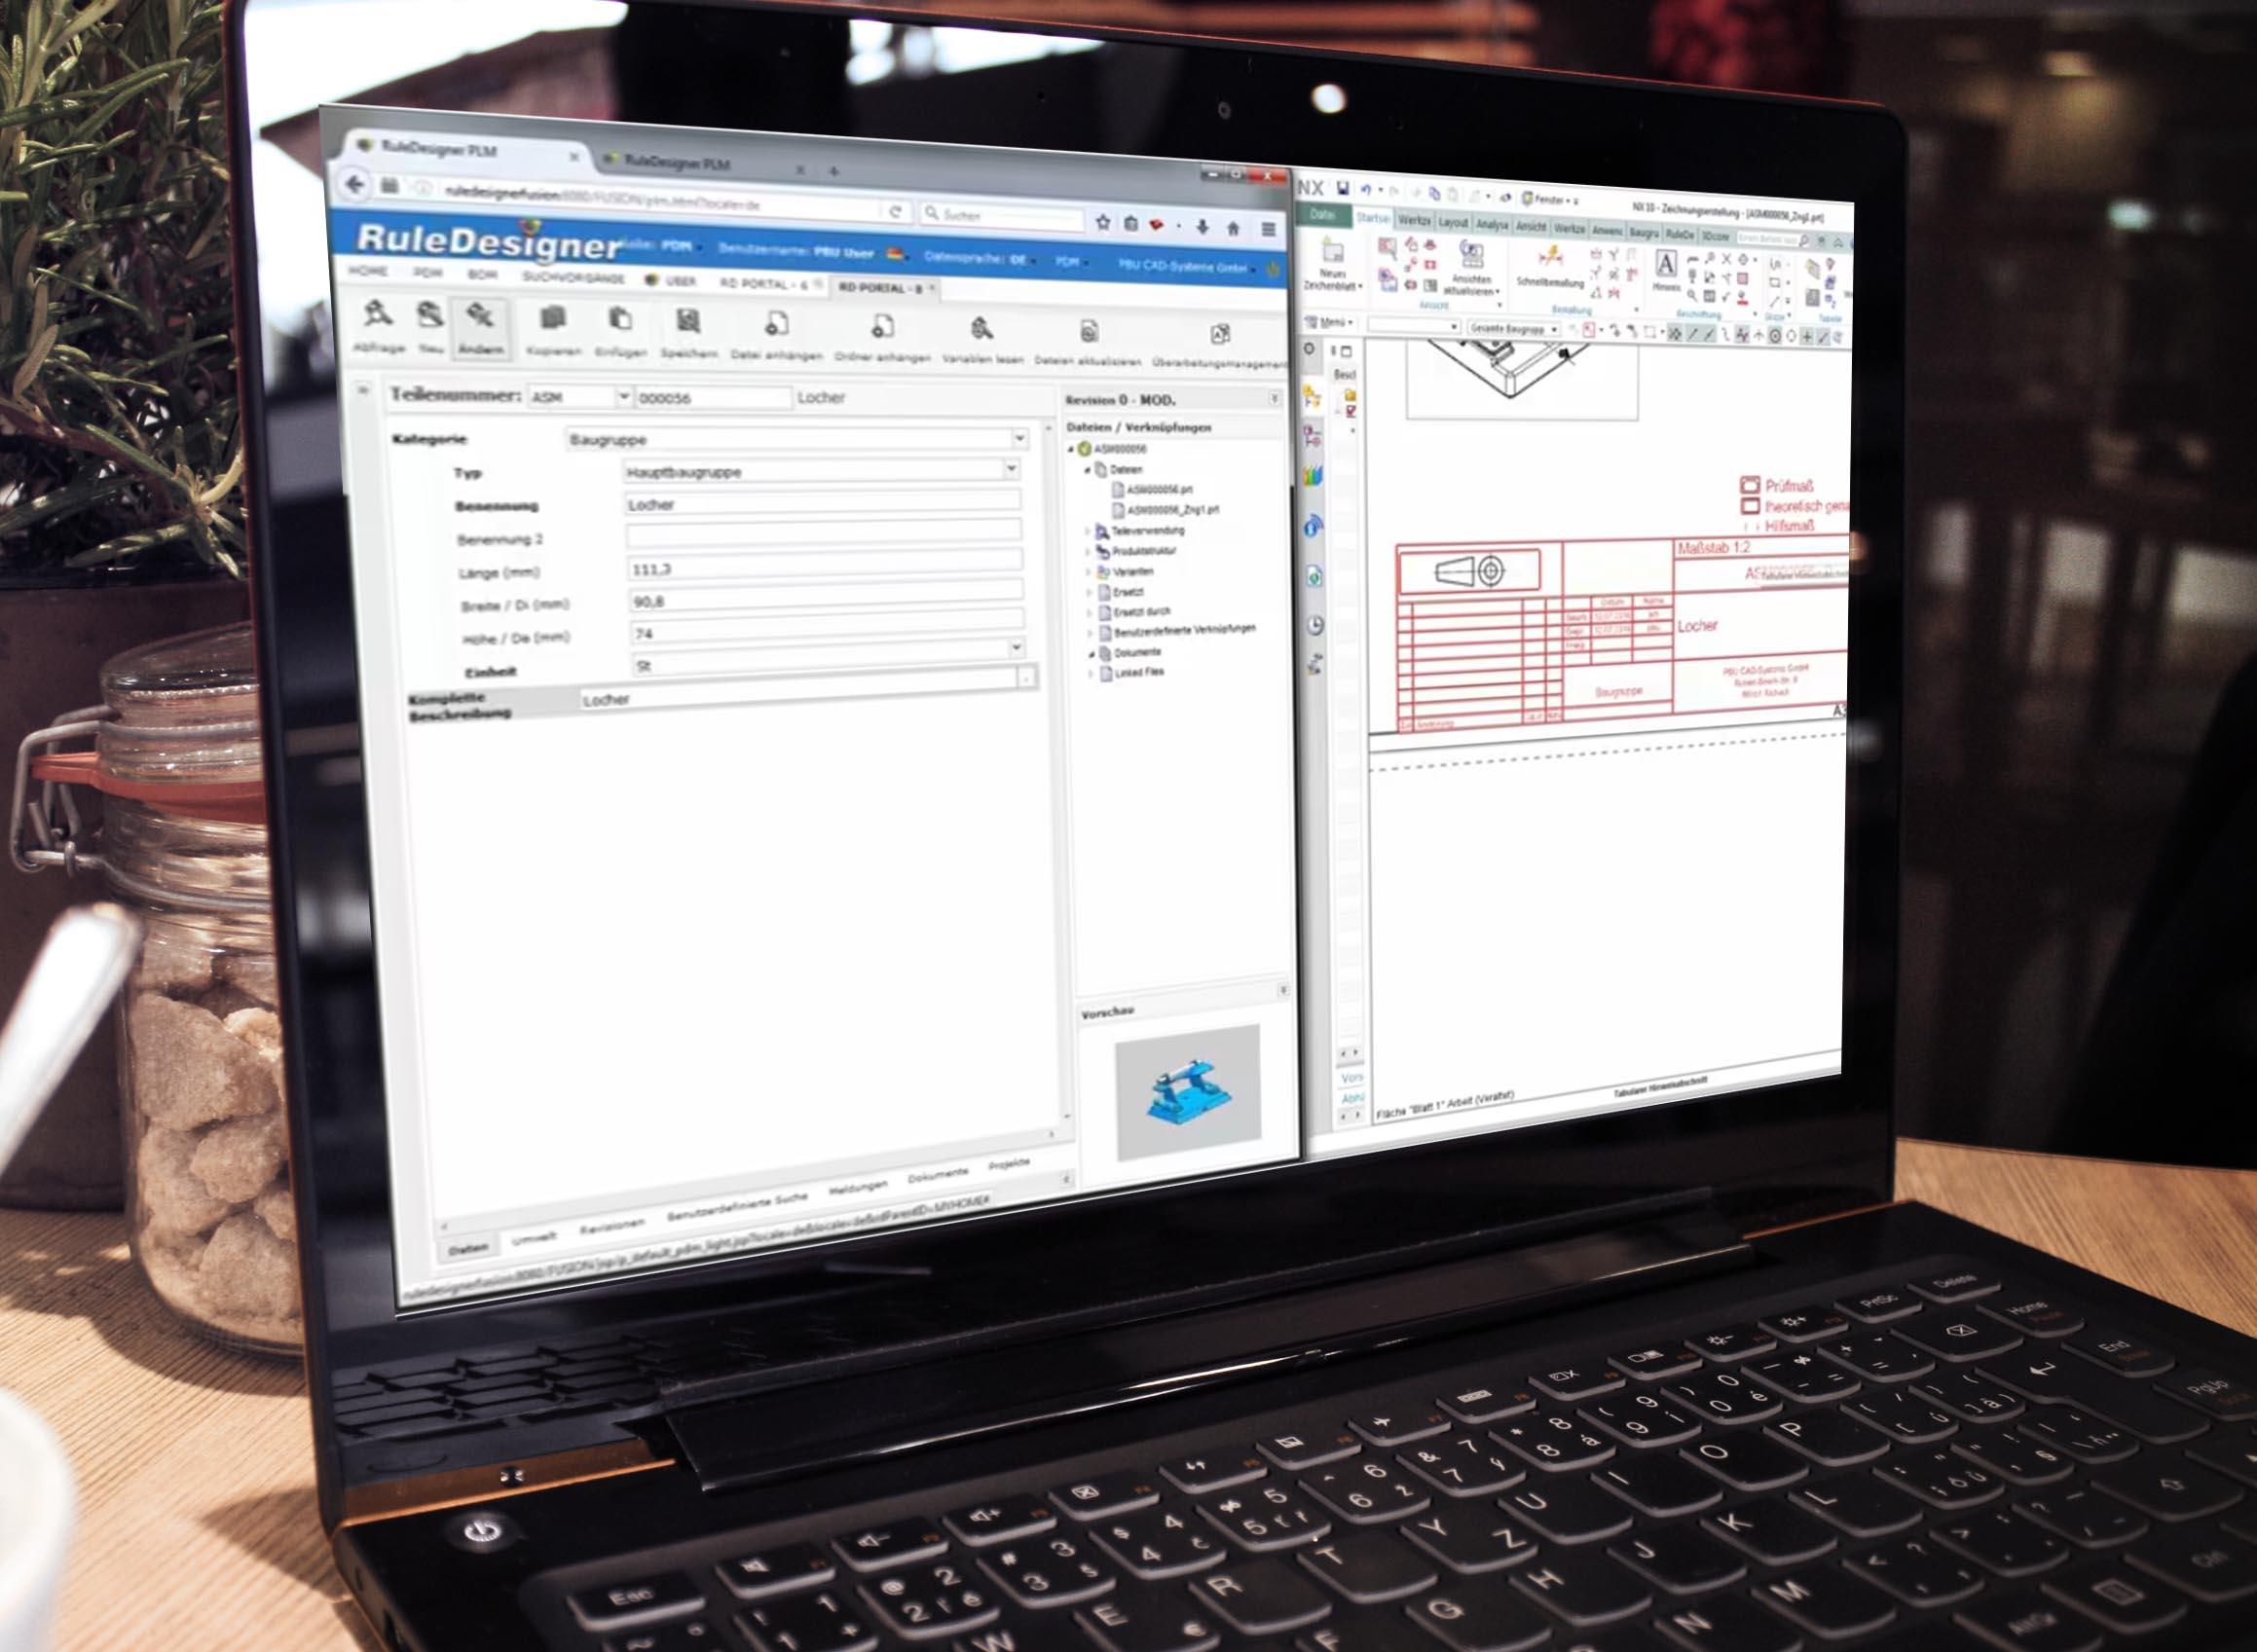 RuleDesigner PDM | Integration for Siemens NX